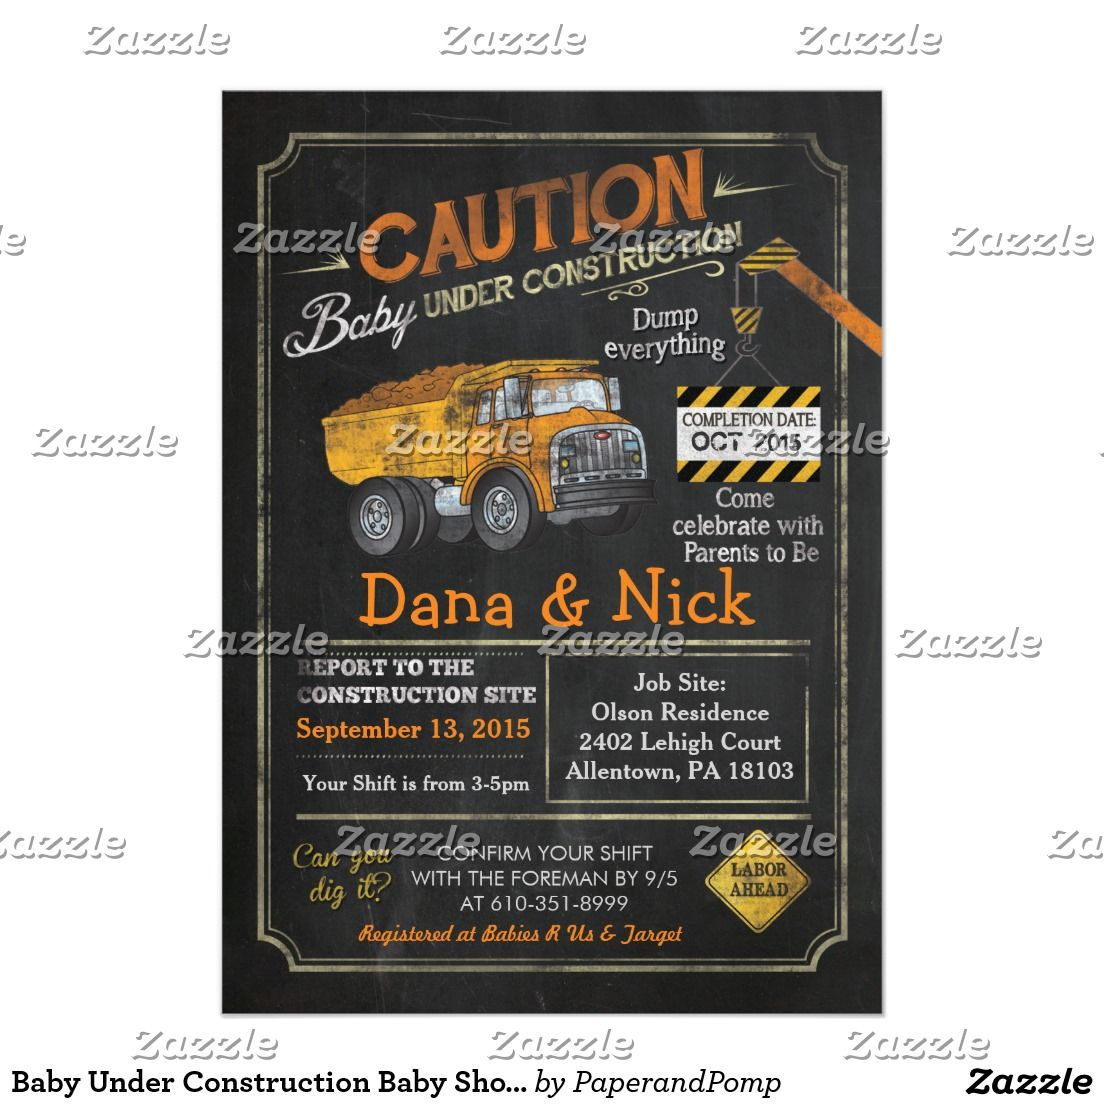 Baby Under Construction Baby Shower Invitation | Shower invitations ...